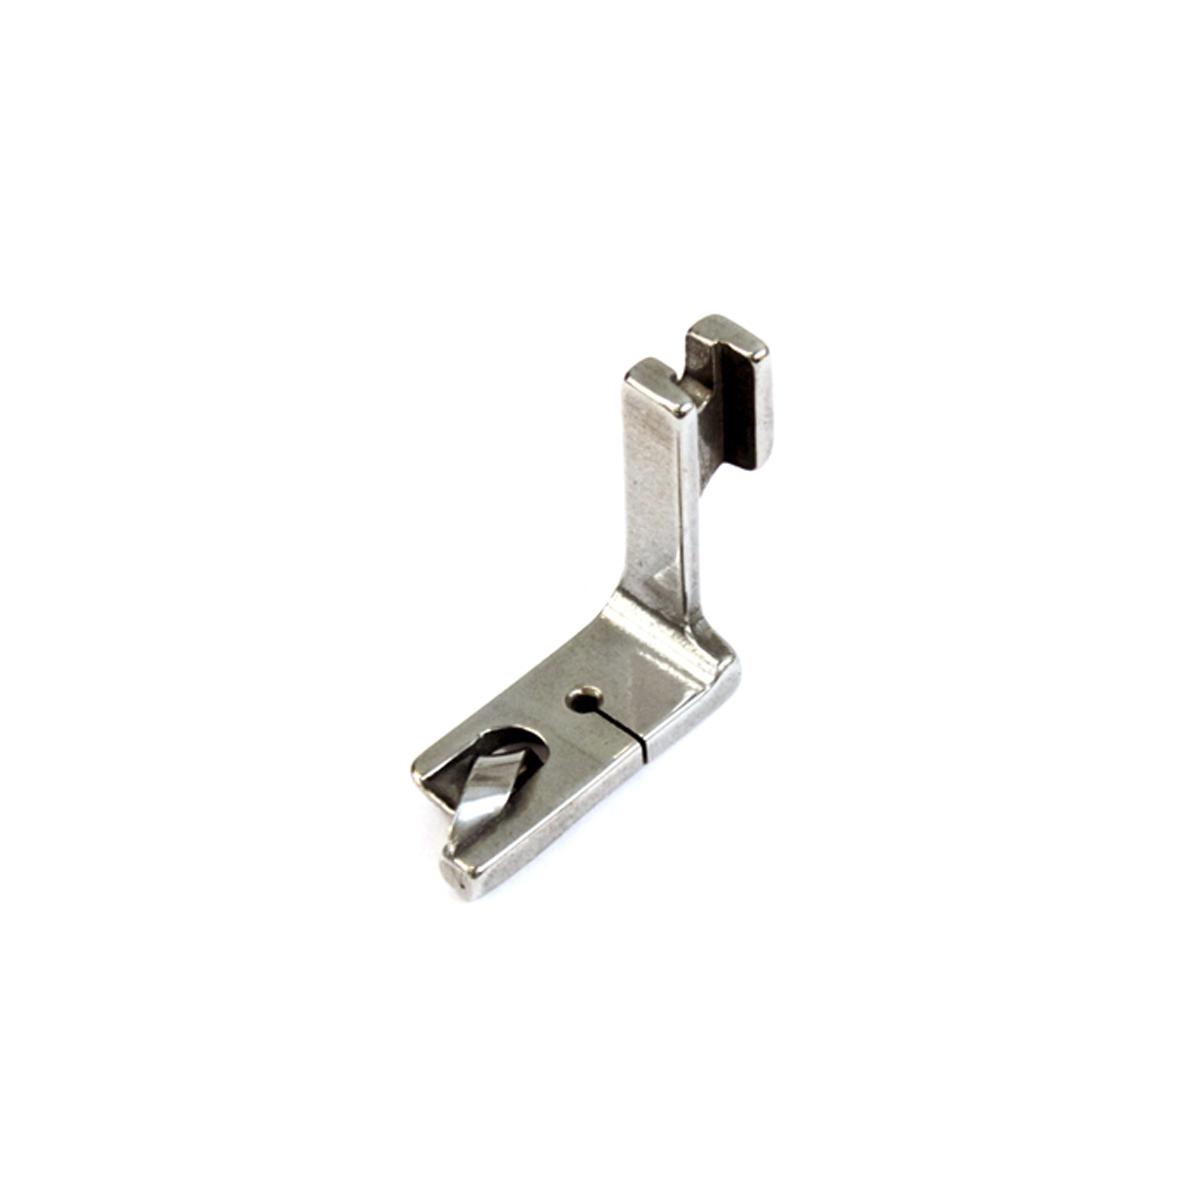 Bestex Лапка подрубочная 3/16-4,8мм ПШМ486380